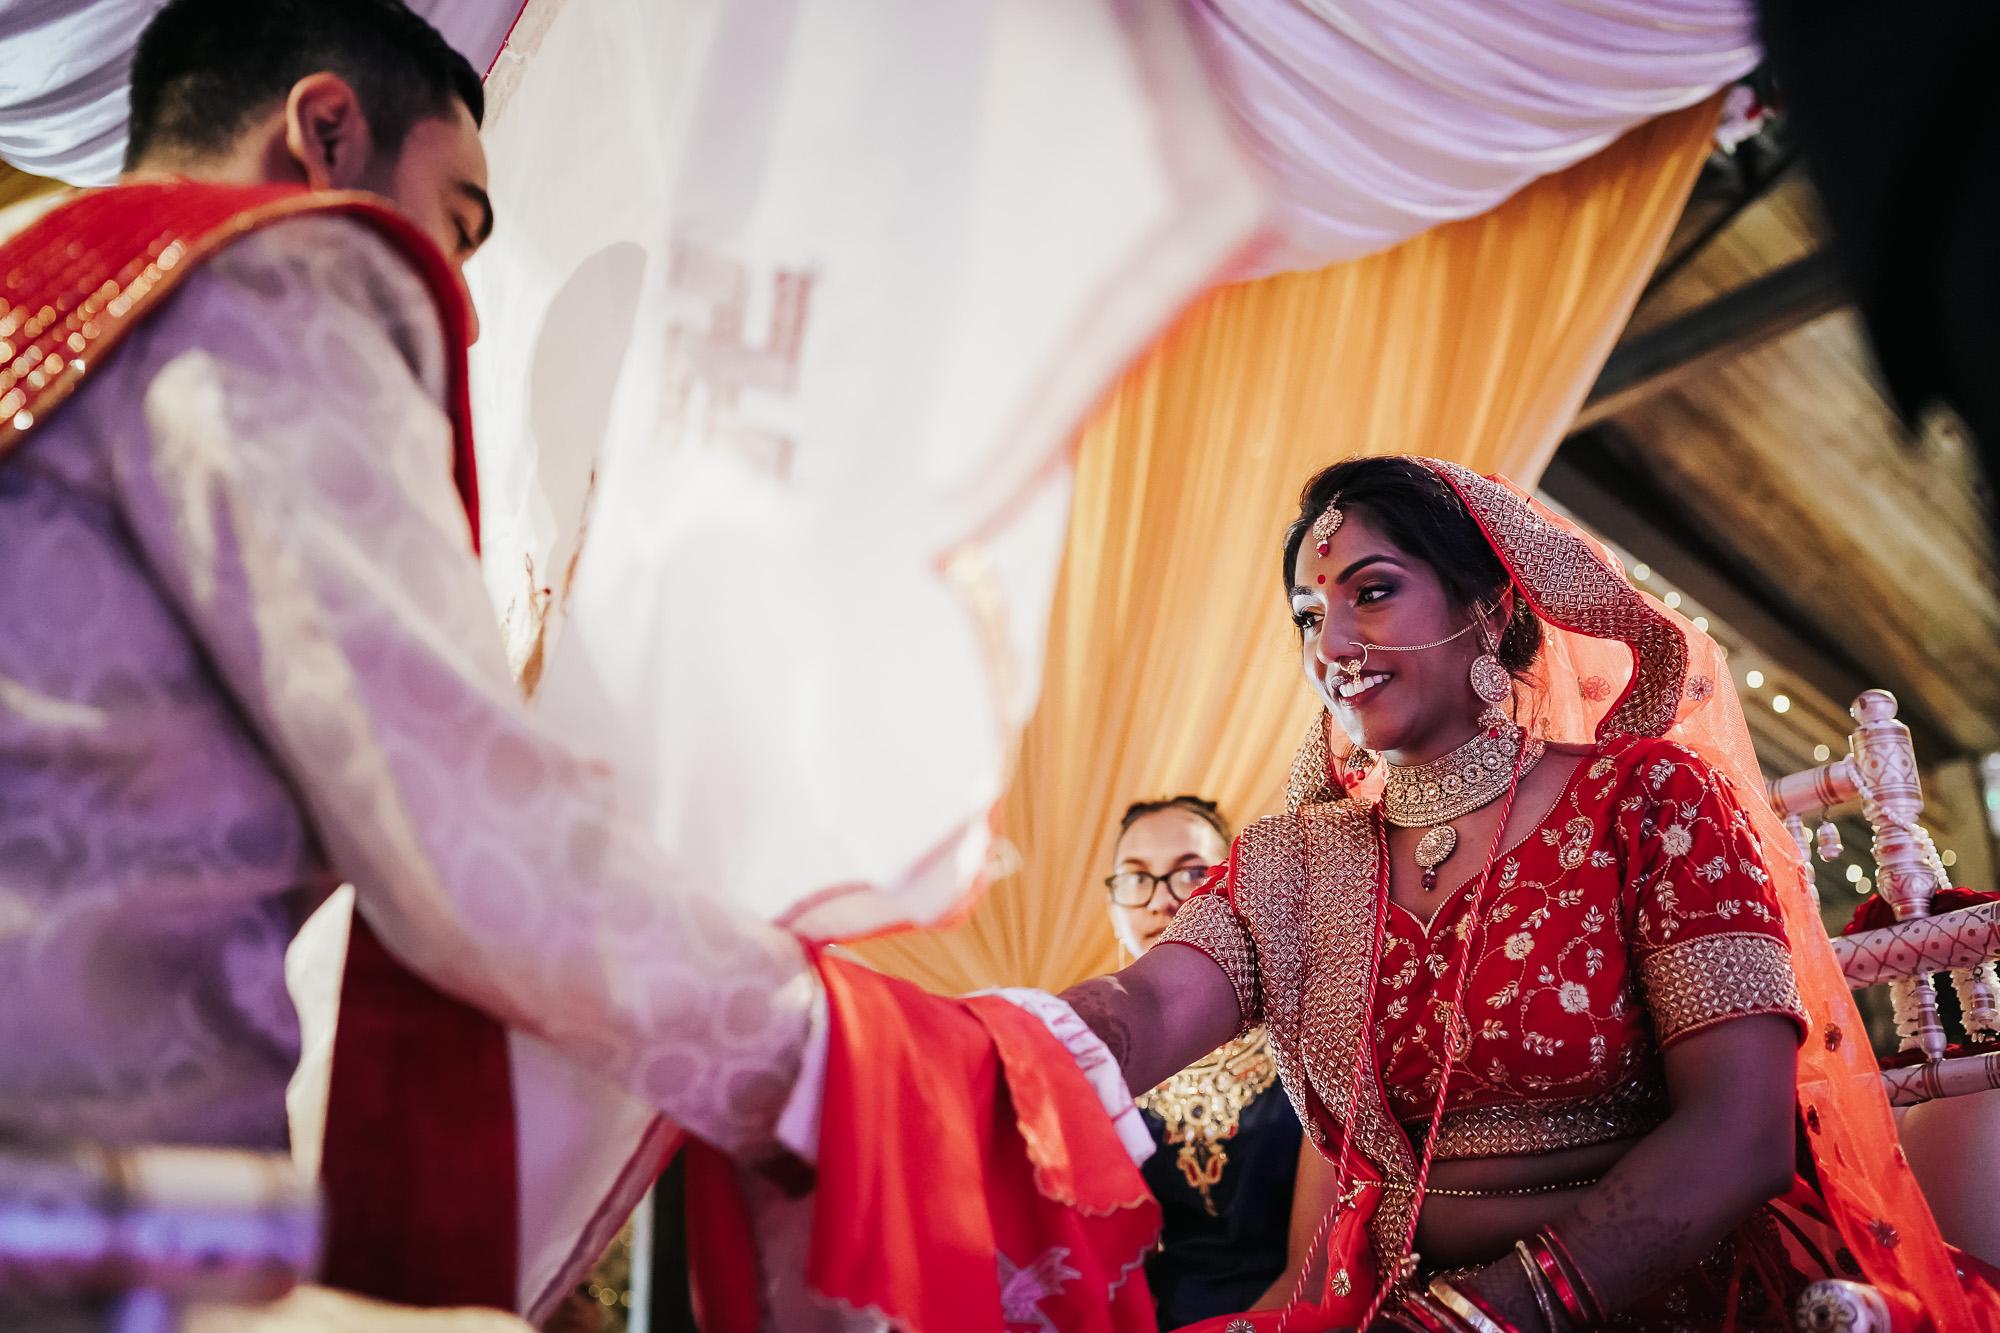 Alcumlow Hall Farm Indian Wedding Photographer (13 of 44).jpg